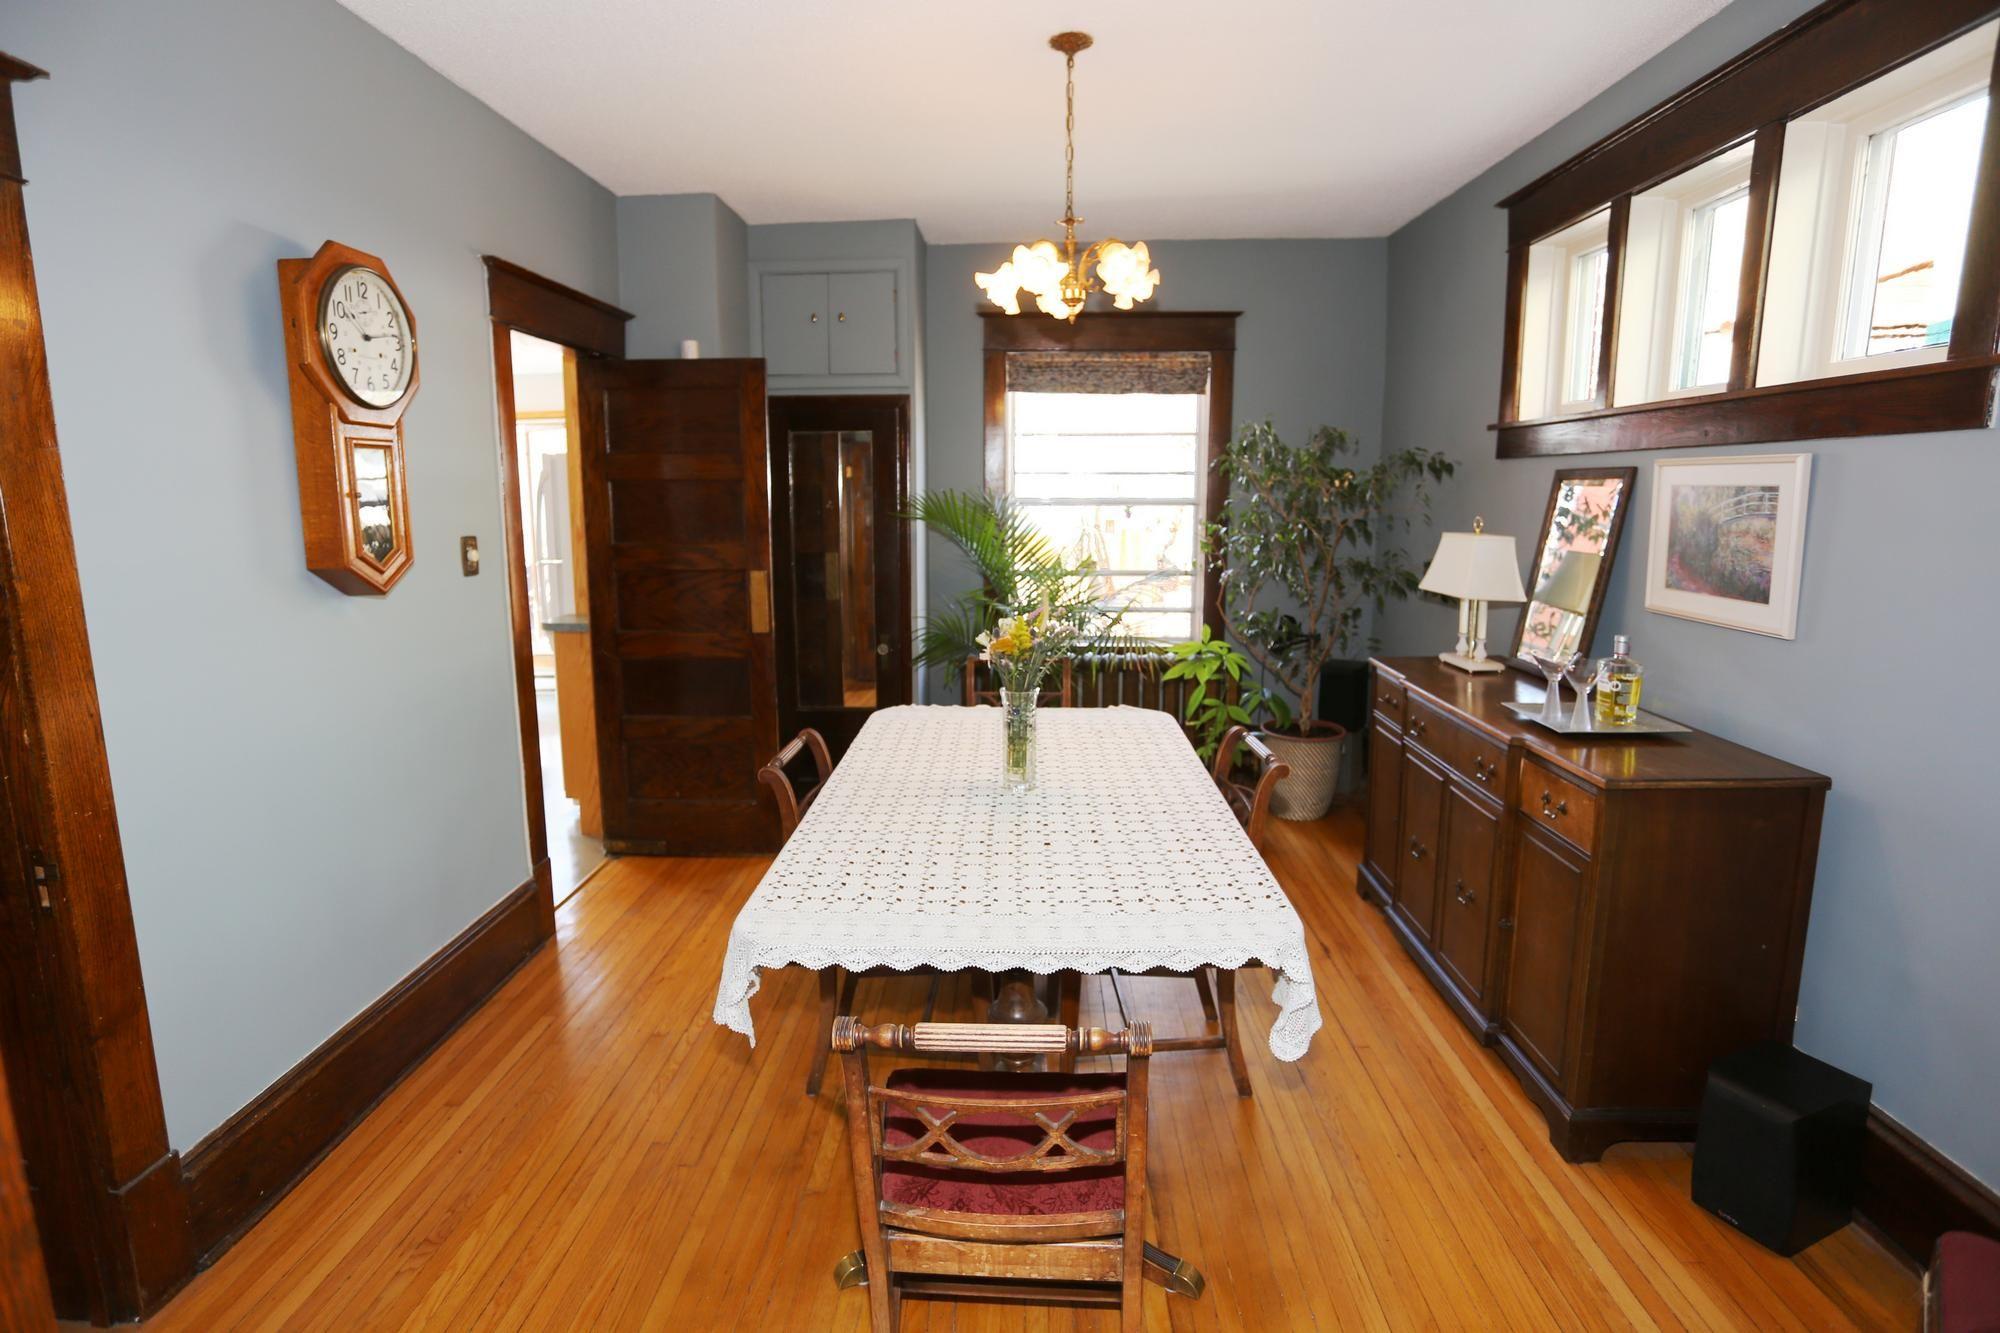 Photo 9: Photos: 96 Home Street in Winnipeg: Wolseley Single Family Detached for sale (5B)  : MLS®# 1810985